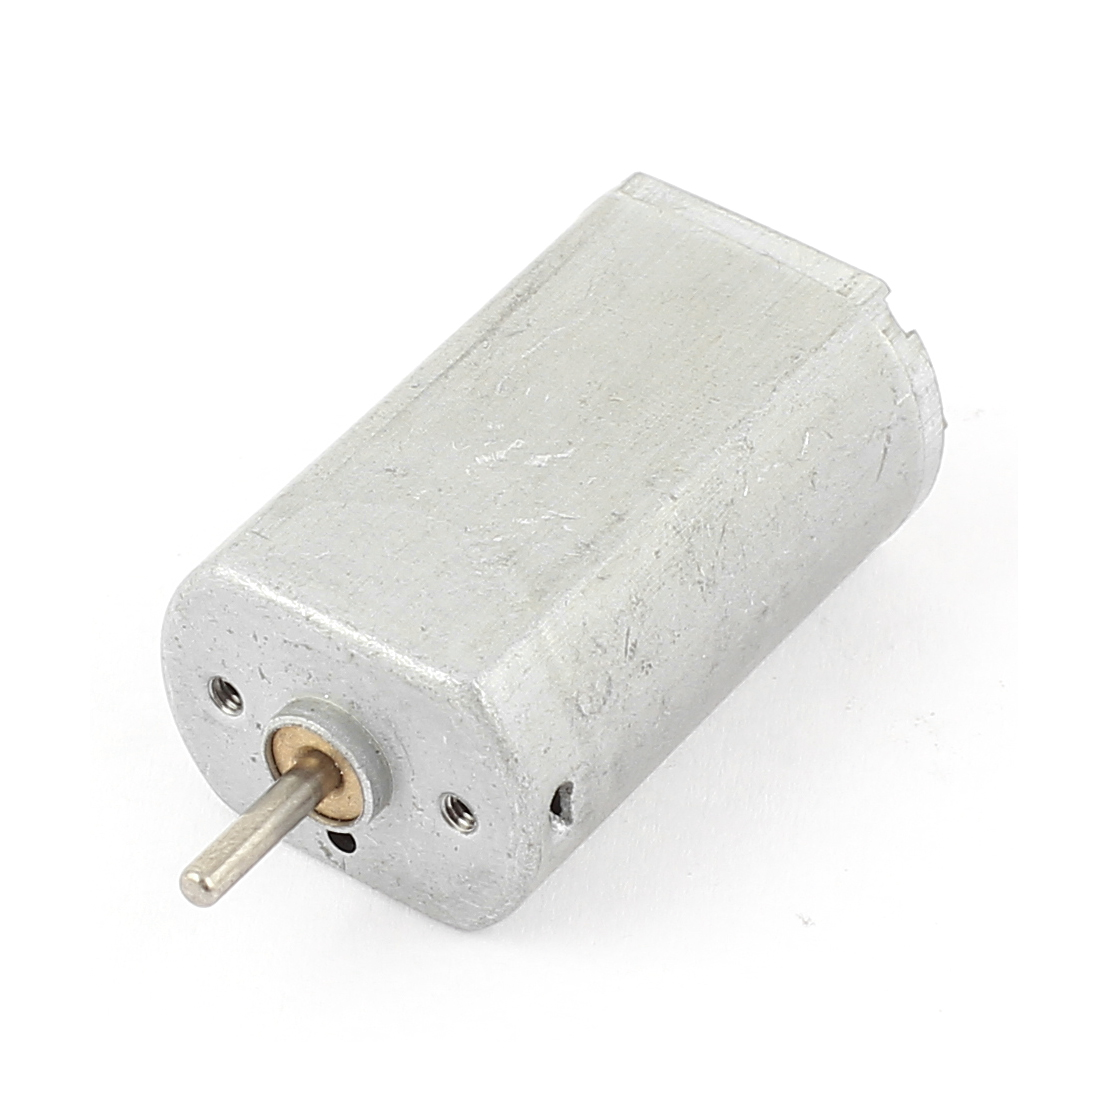 3-6V 25000RPM 2mm Shaft Dia High Torque Magnet DC Motor for DIY Toys